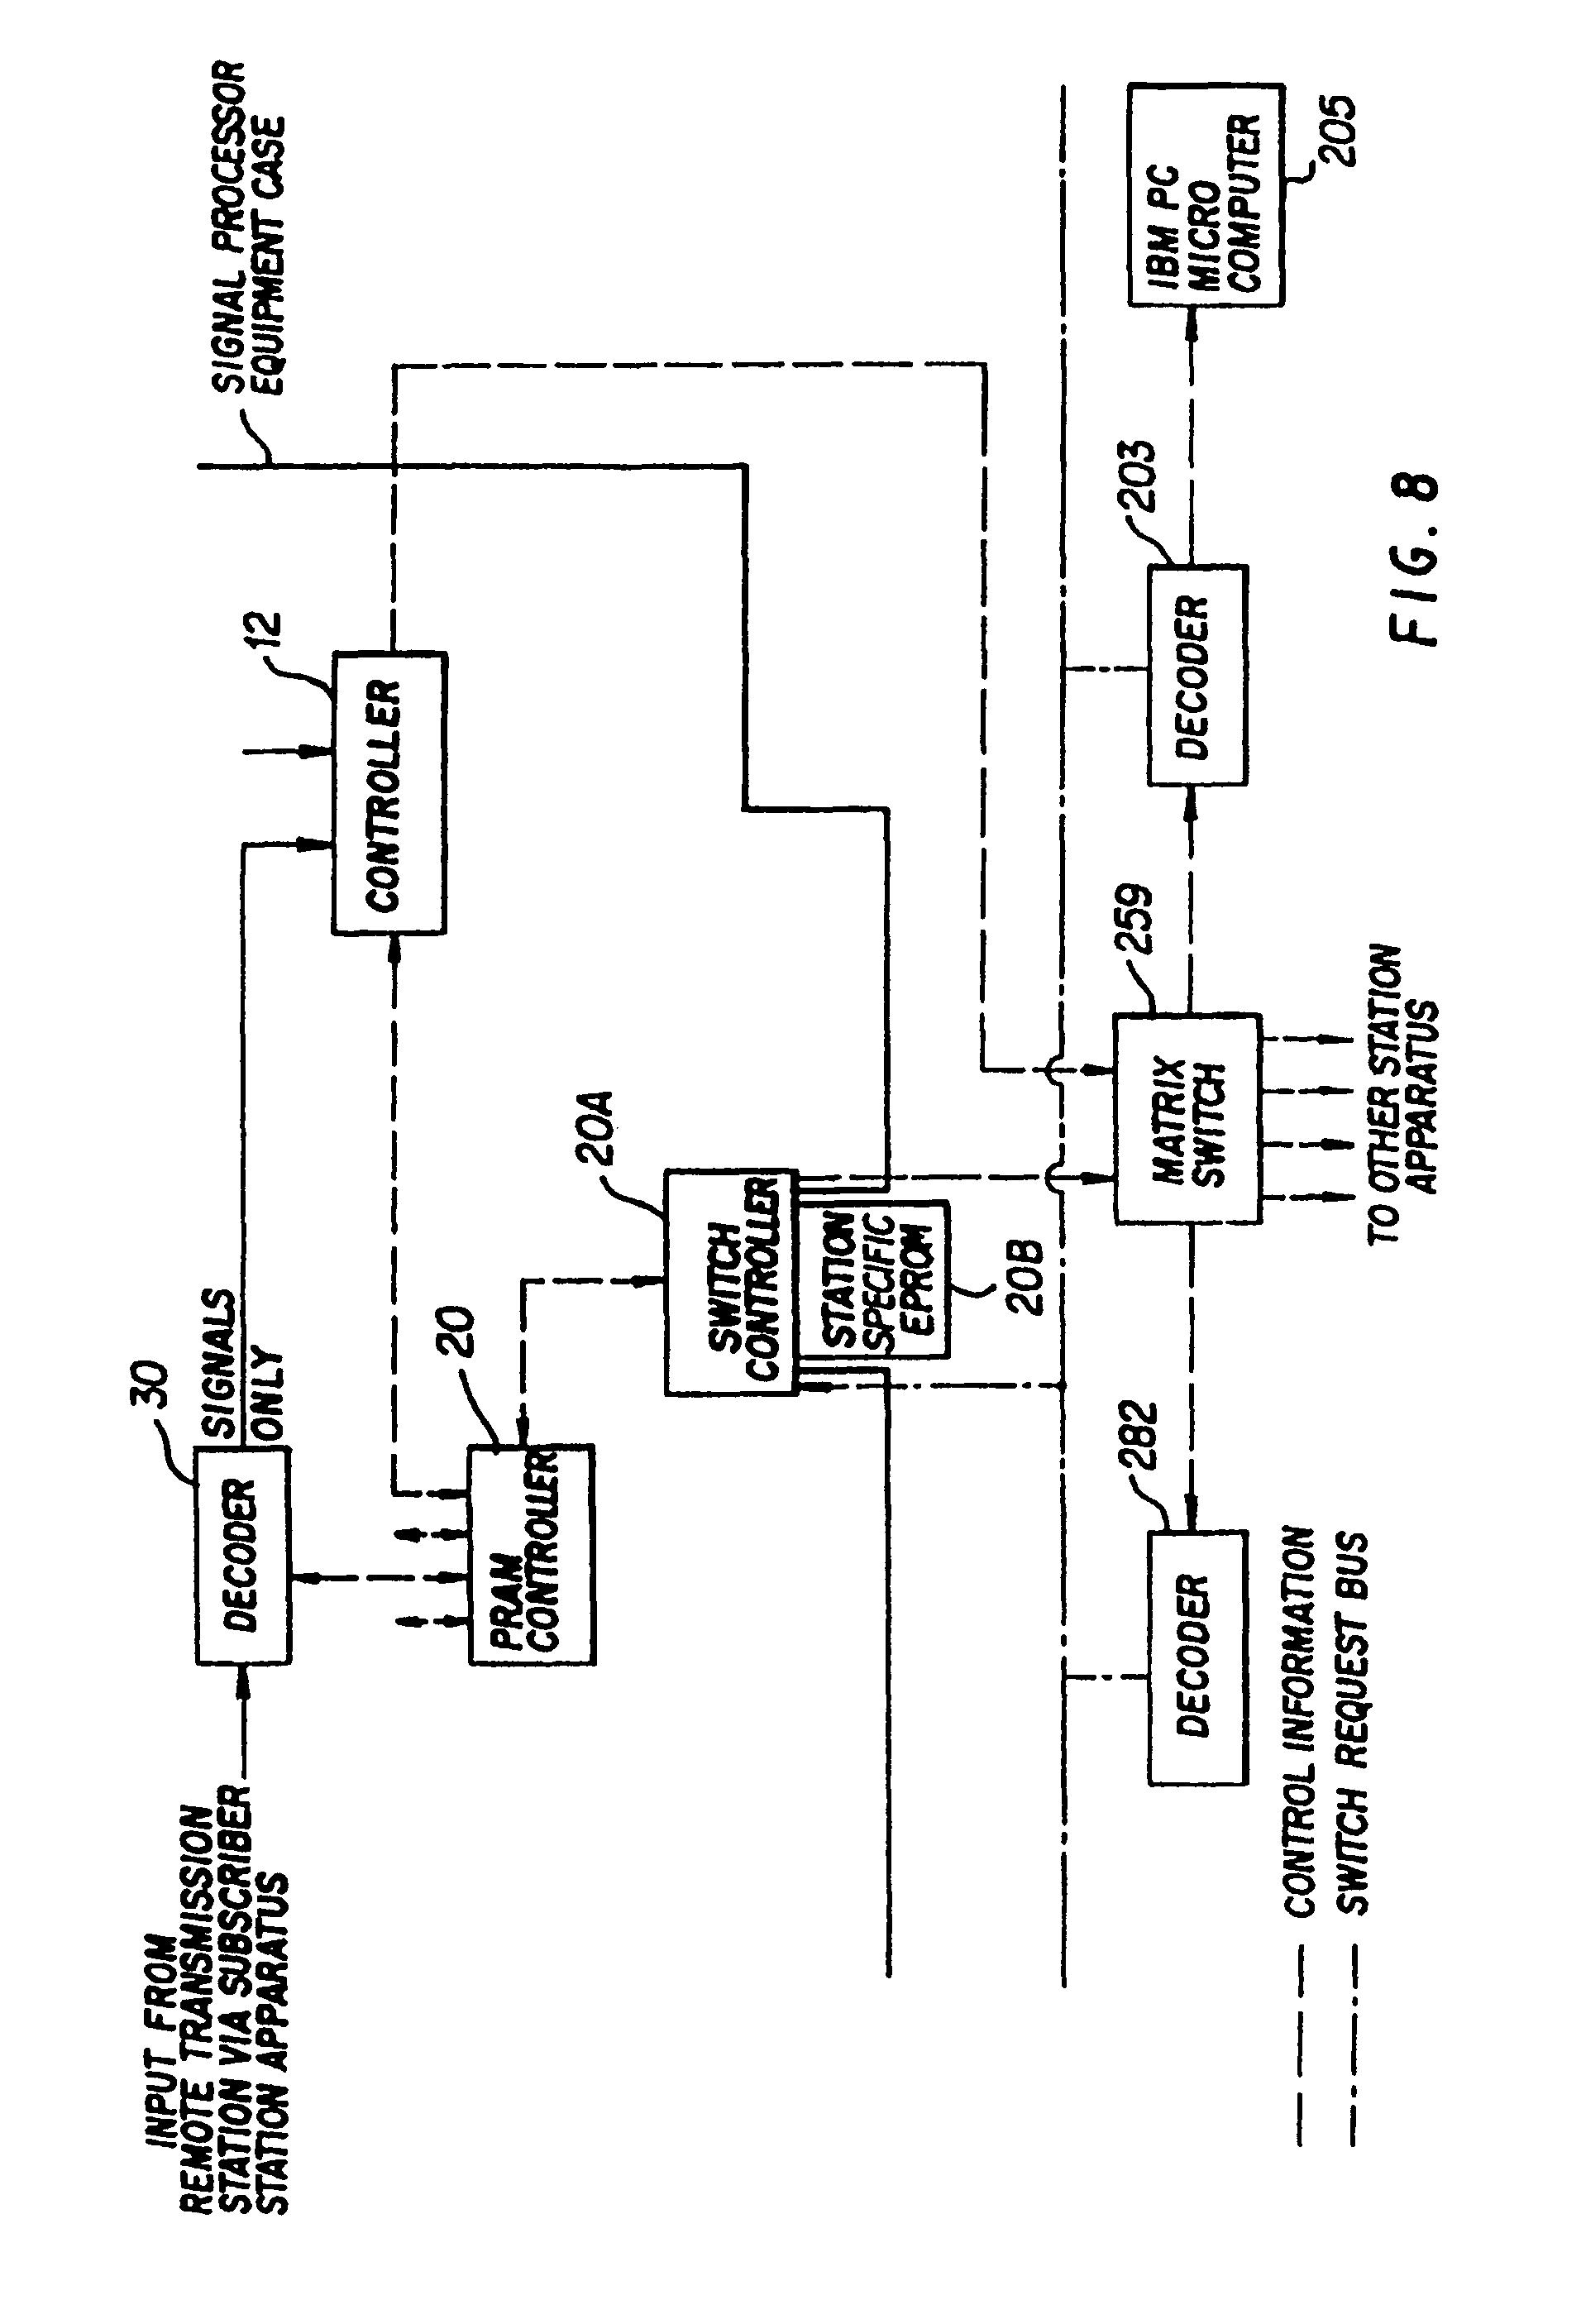 Us7958527b1 Signal Processing Apparatus And Methods Google Patents Saab Sid Wiring Diagram